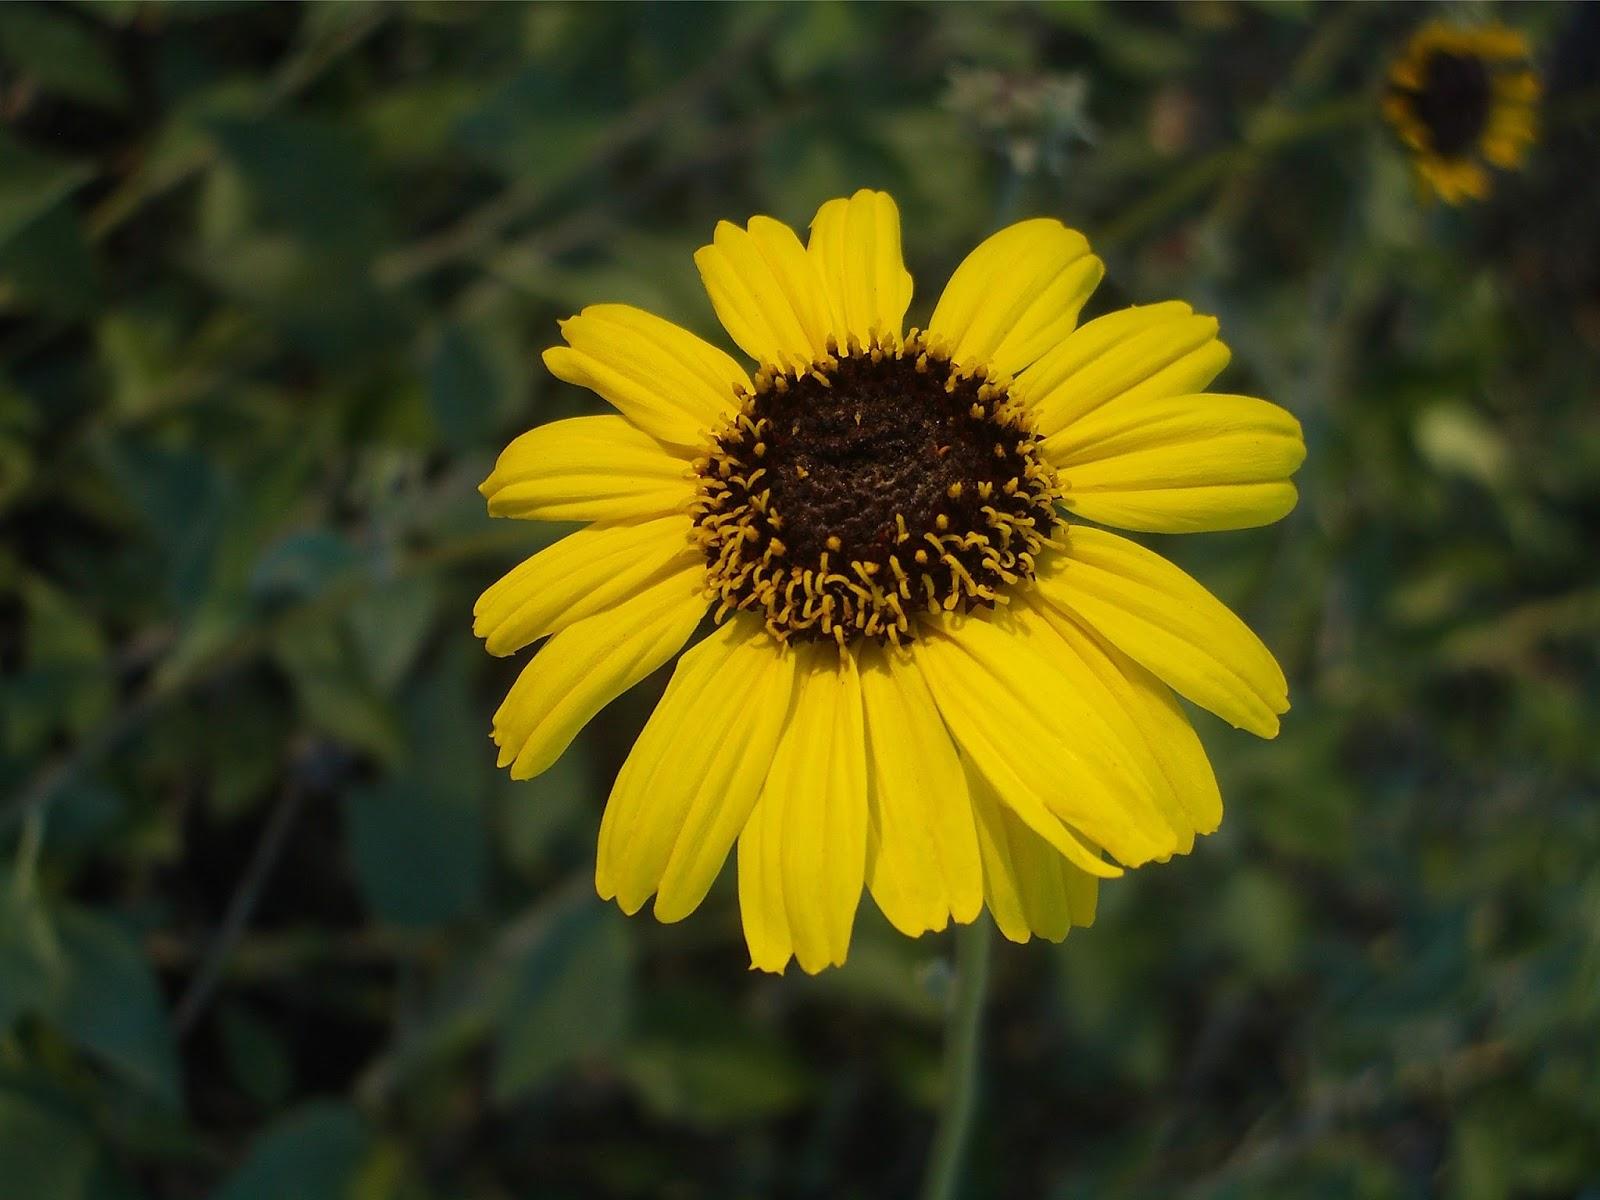 California Sunflower by Cliff Hutson